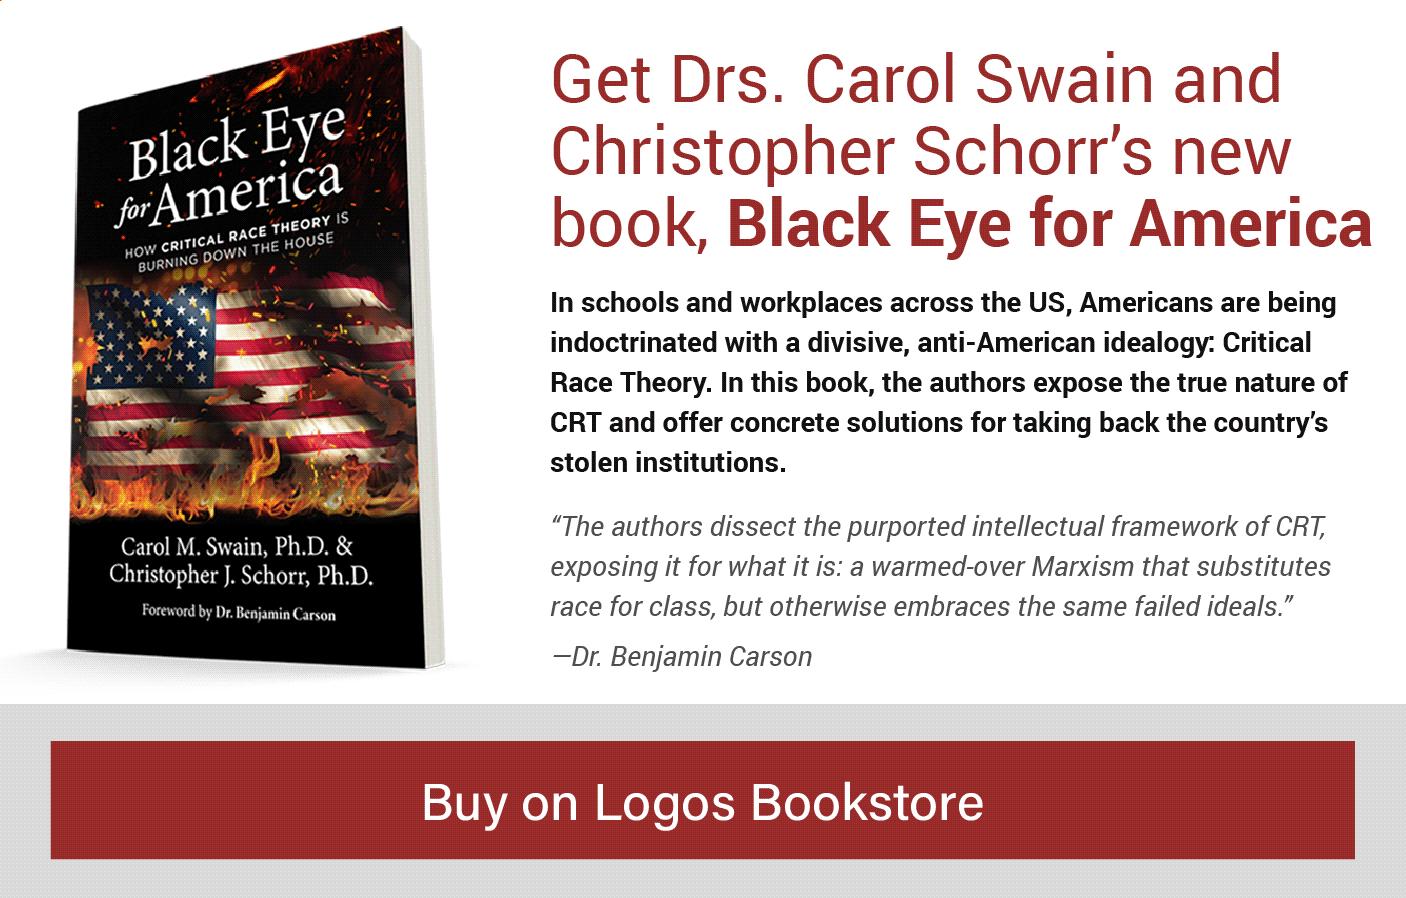 Buy Black Eye for America on Logos Bookstore